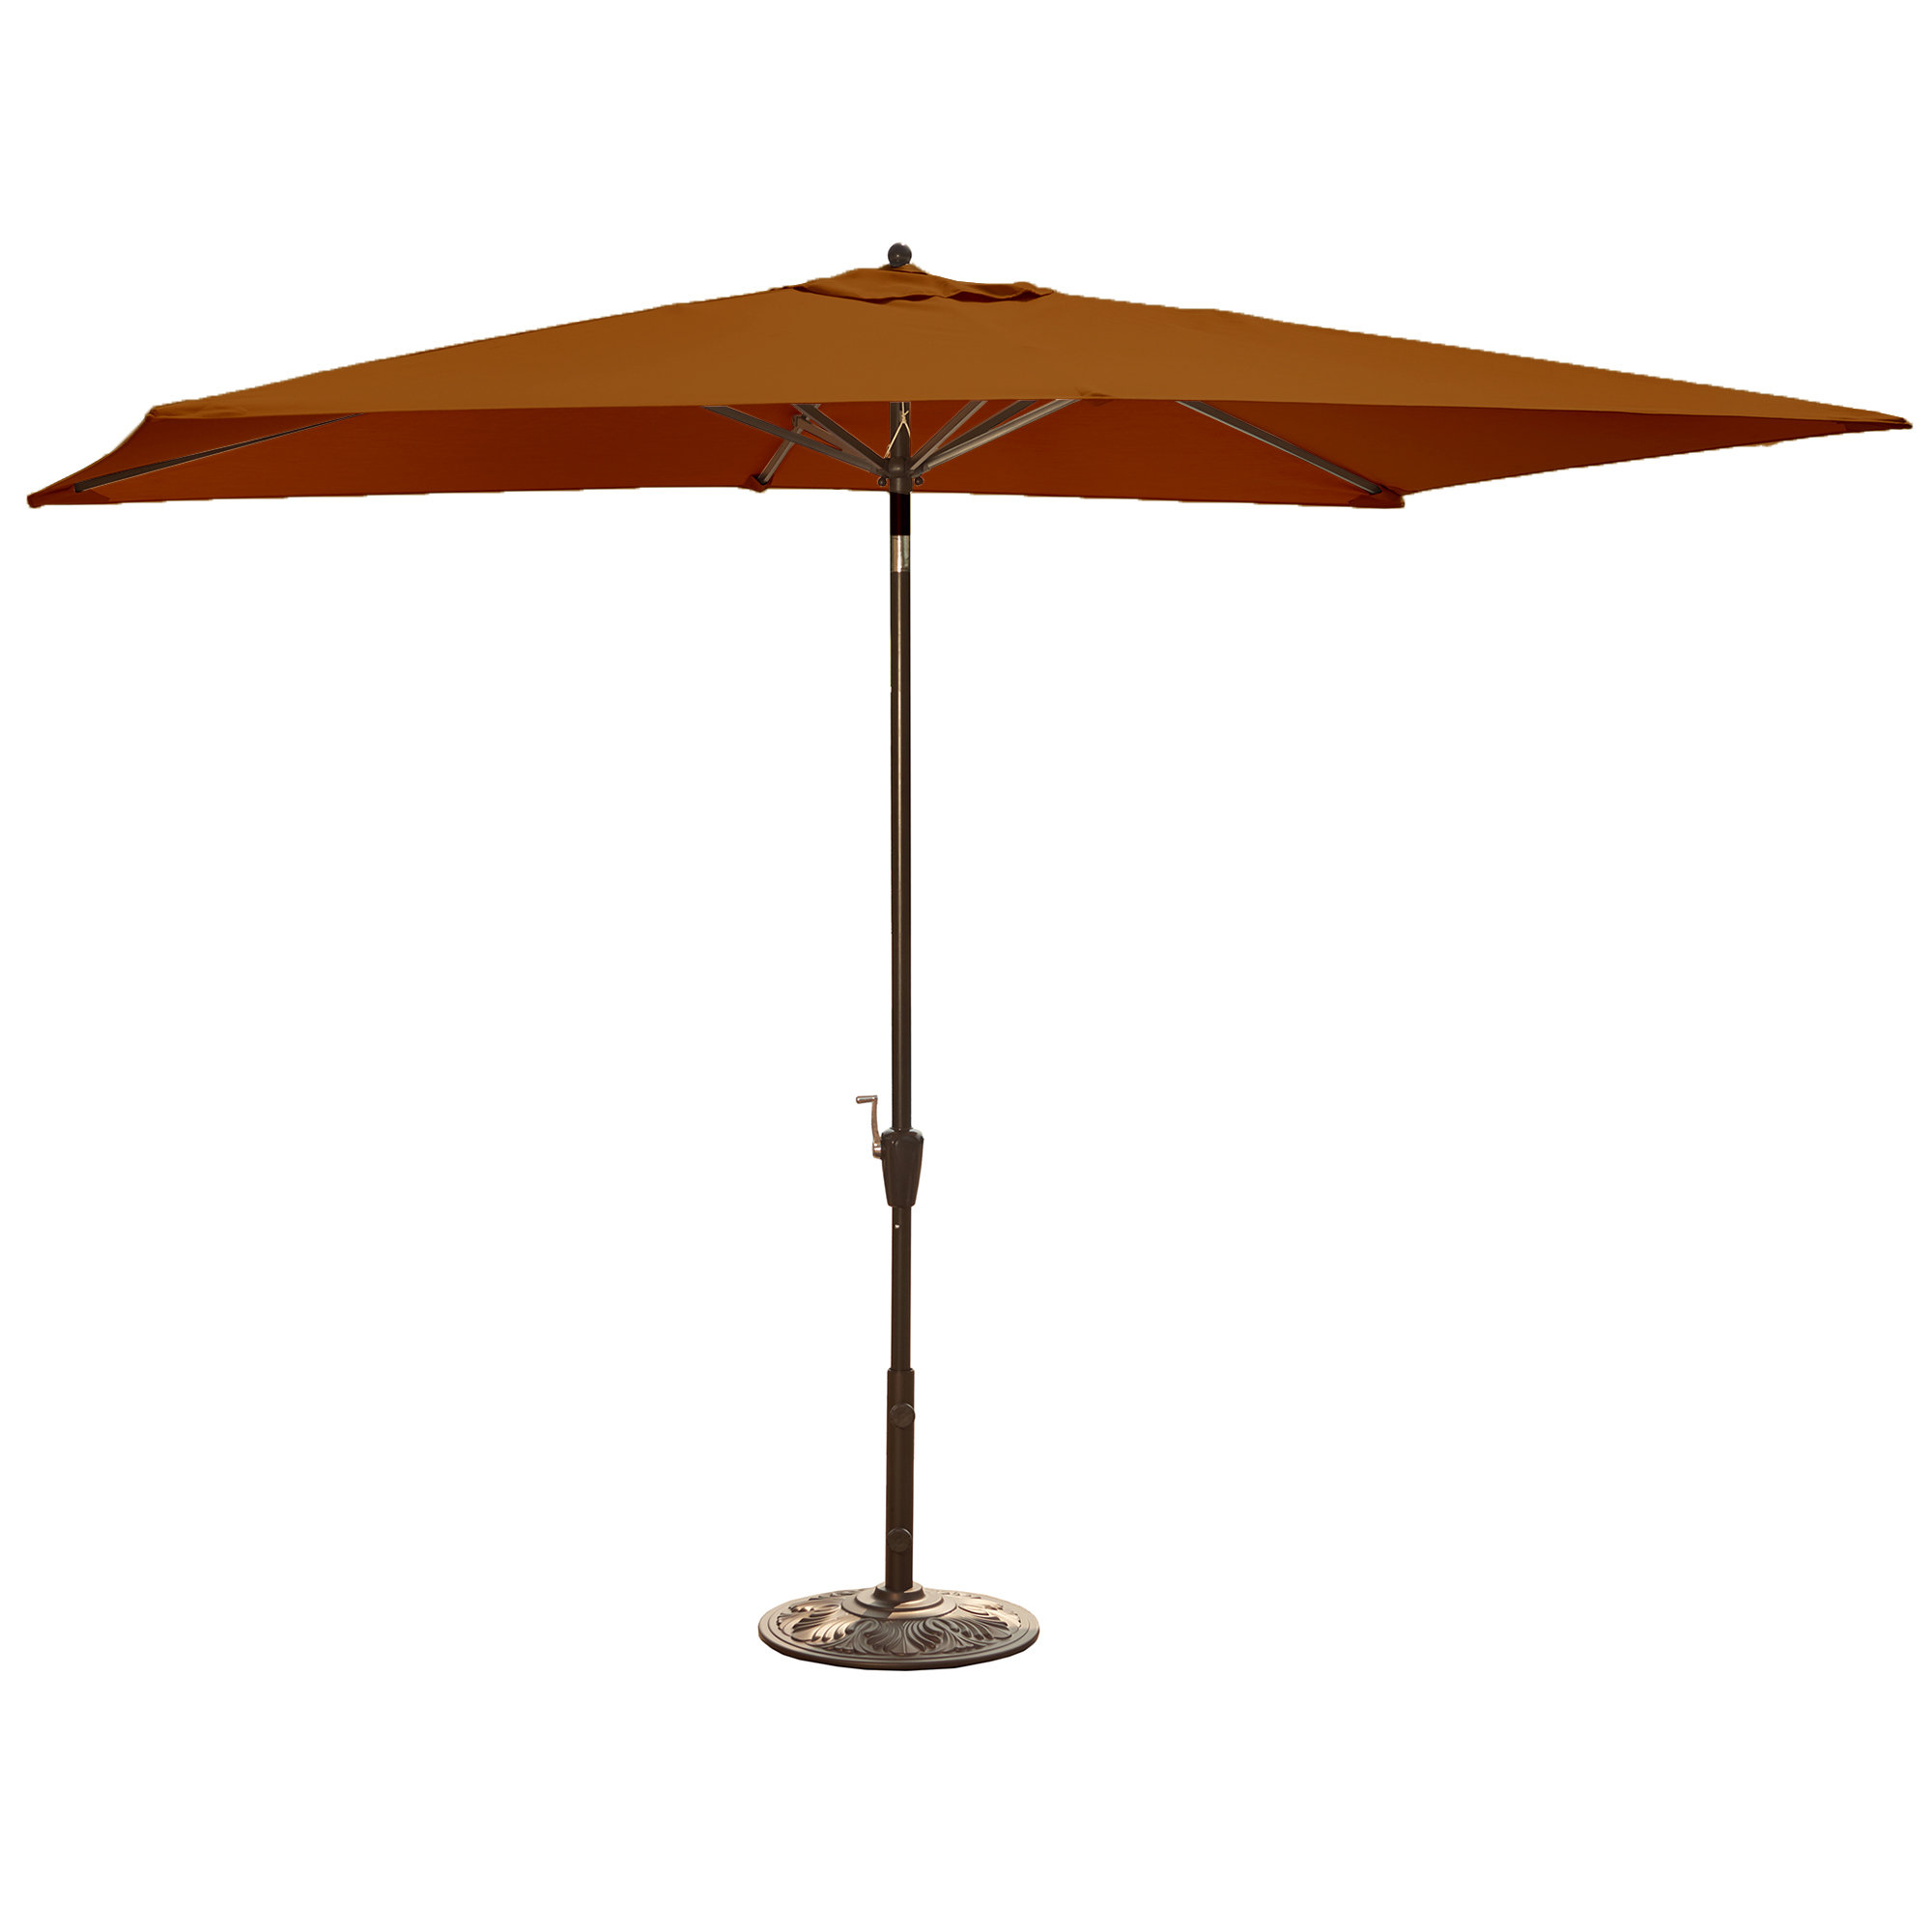 Wieczorek Auto Tilt Rectangular Market Sunbrella Umbrellas Pertaining To Well Known Adriatic 10' X  (View 19 of 20)